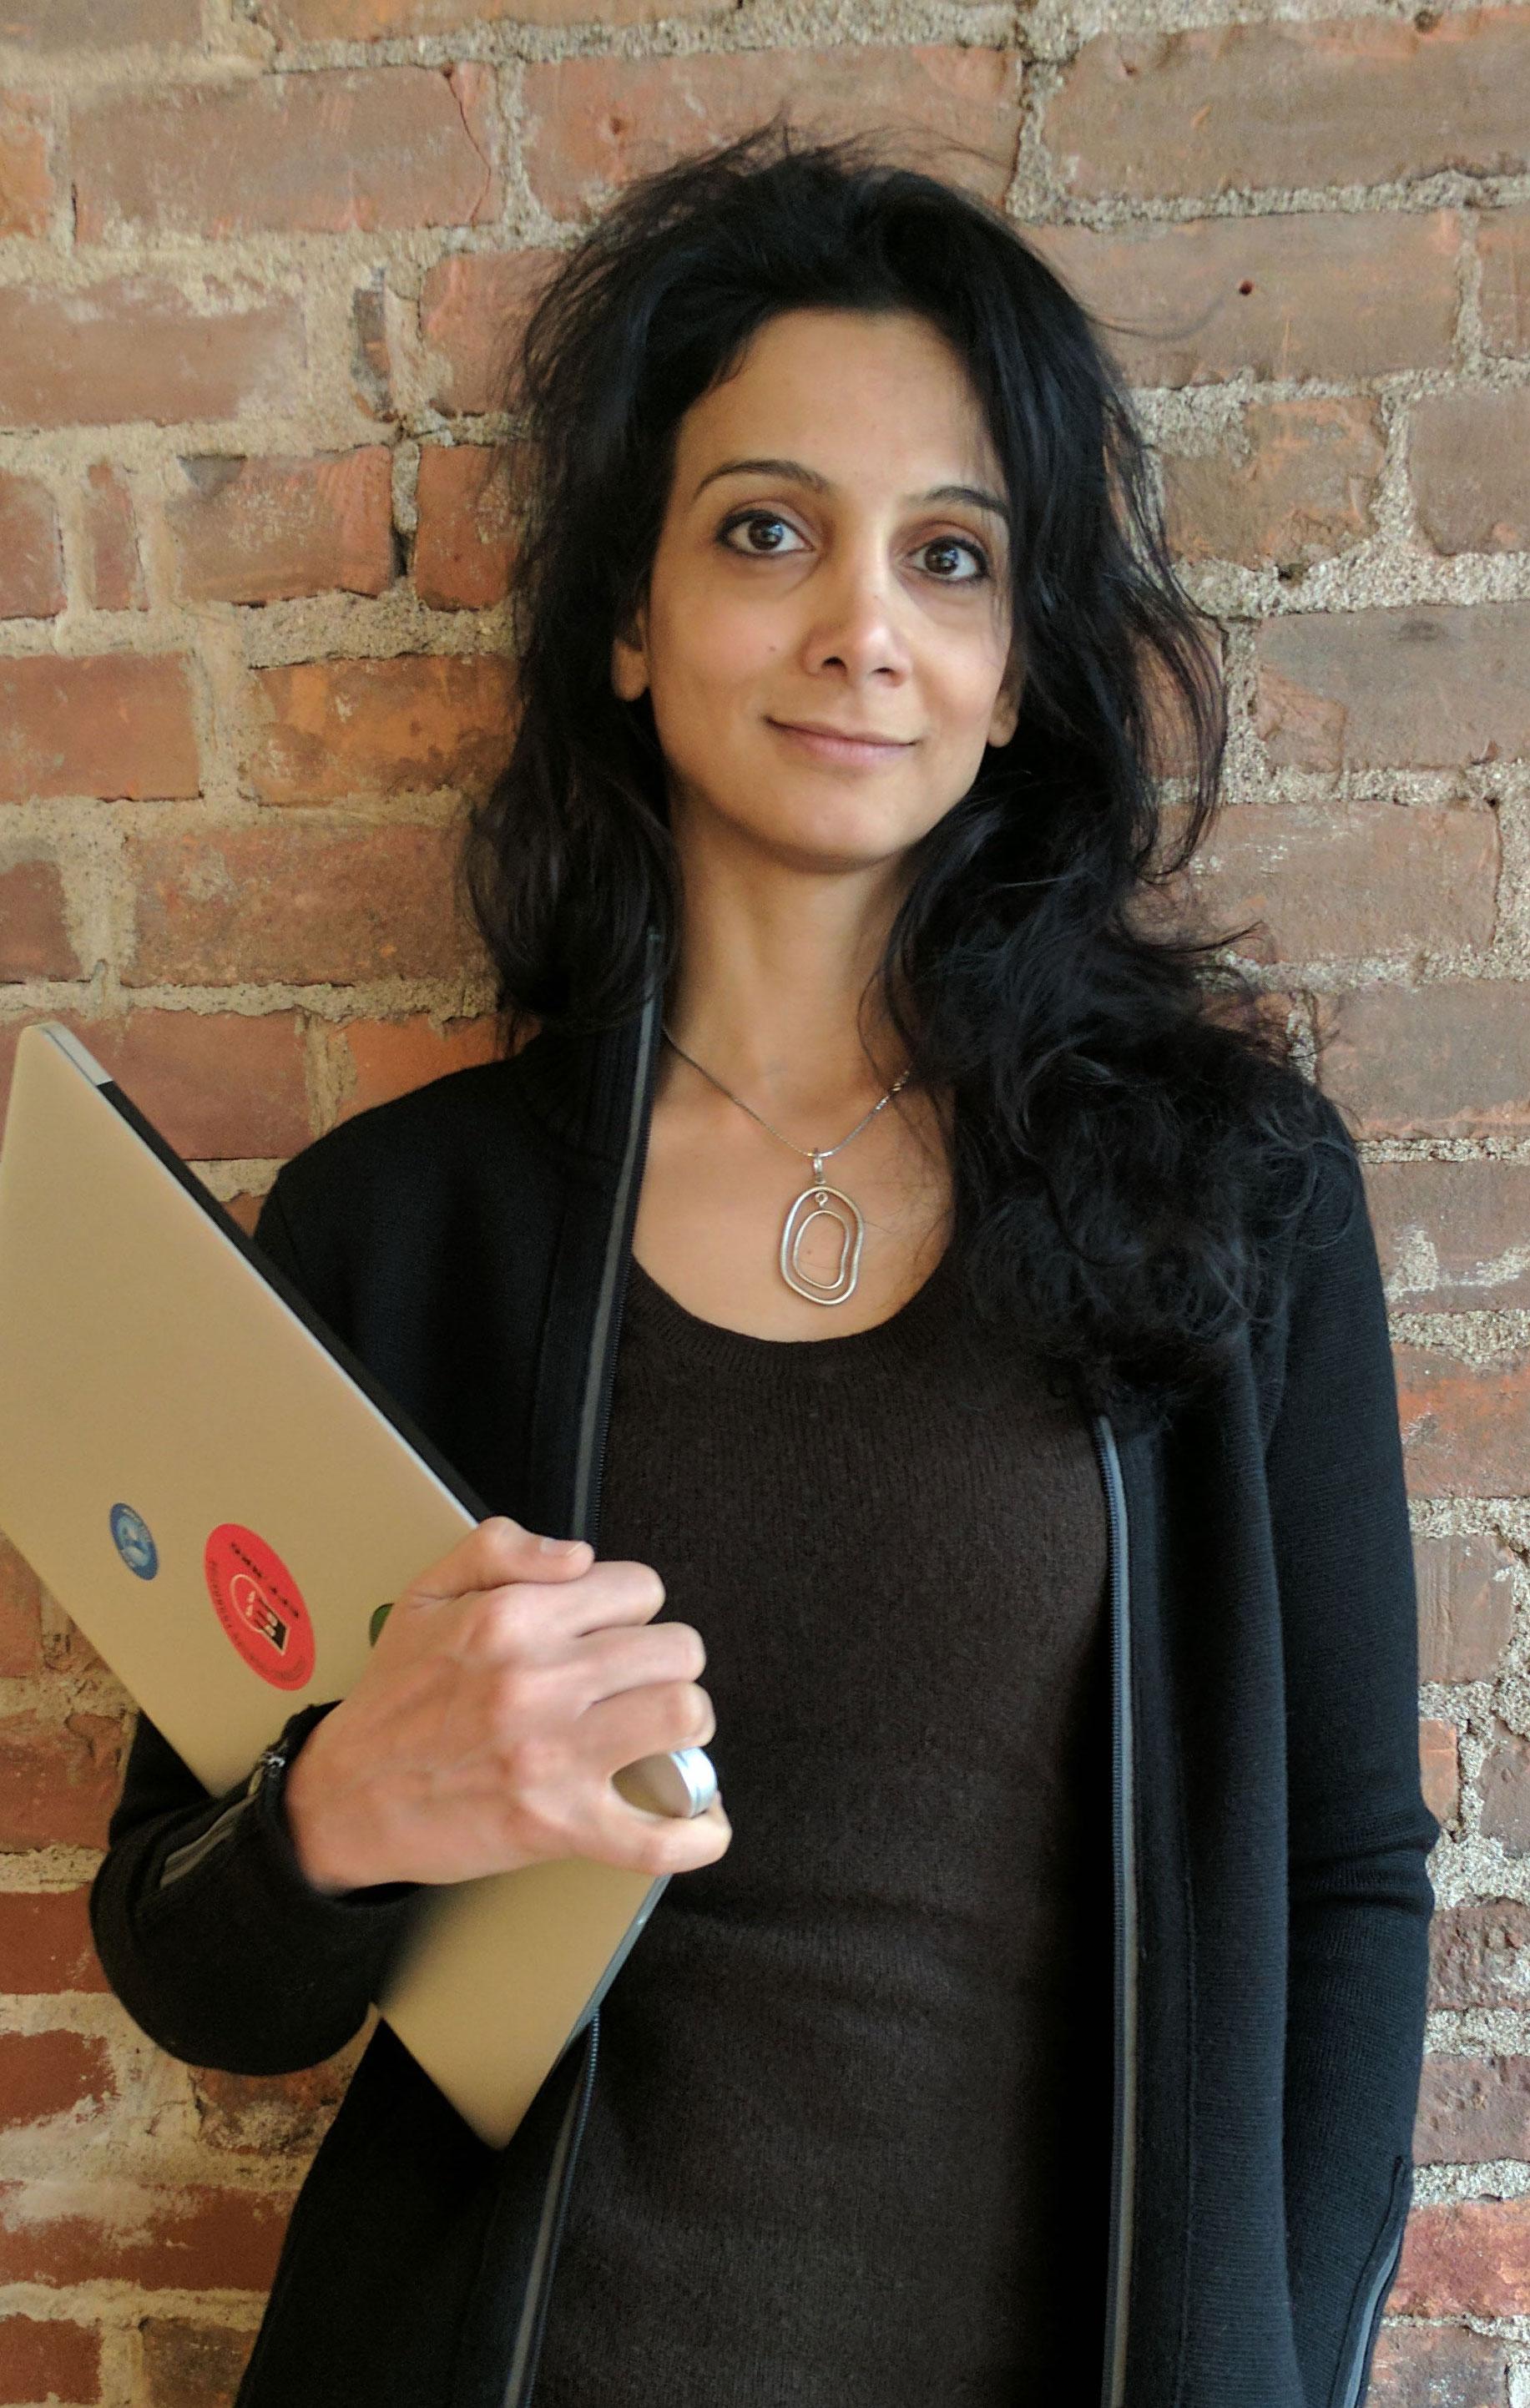 Roya Ensafi U of Michigan profile pic